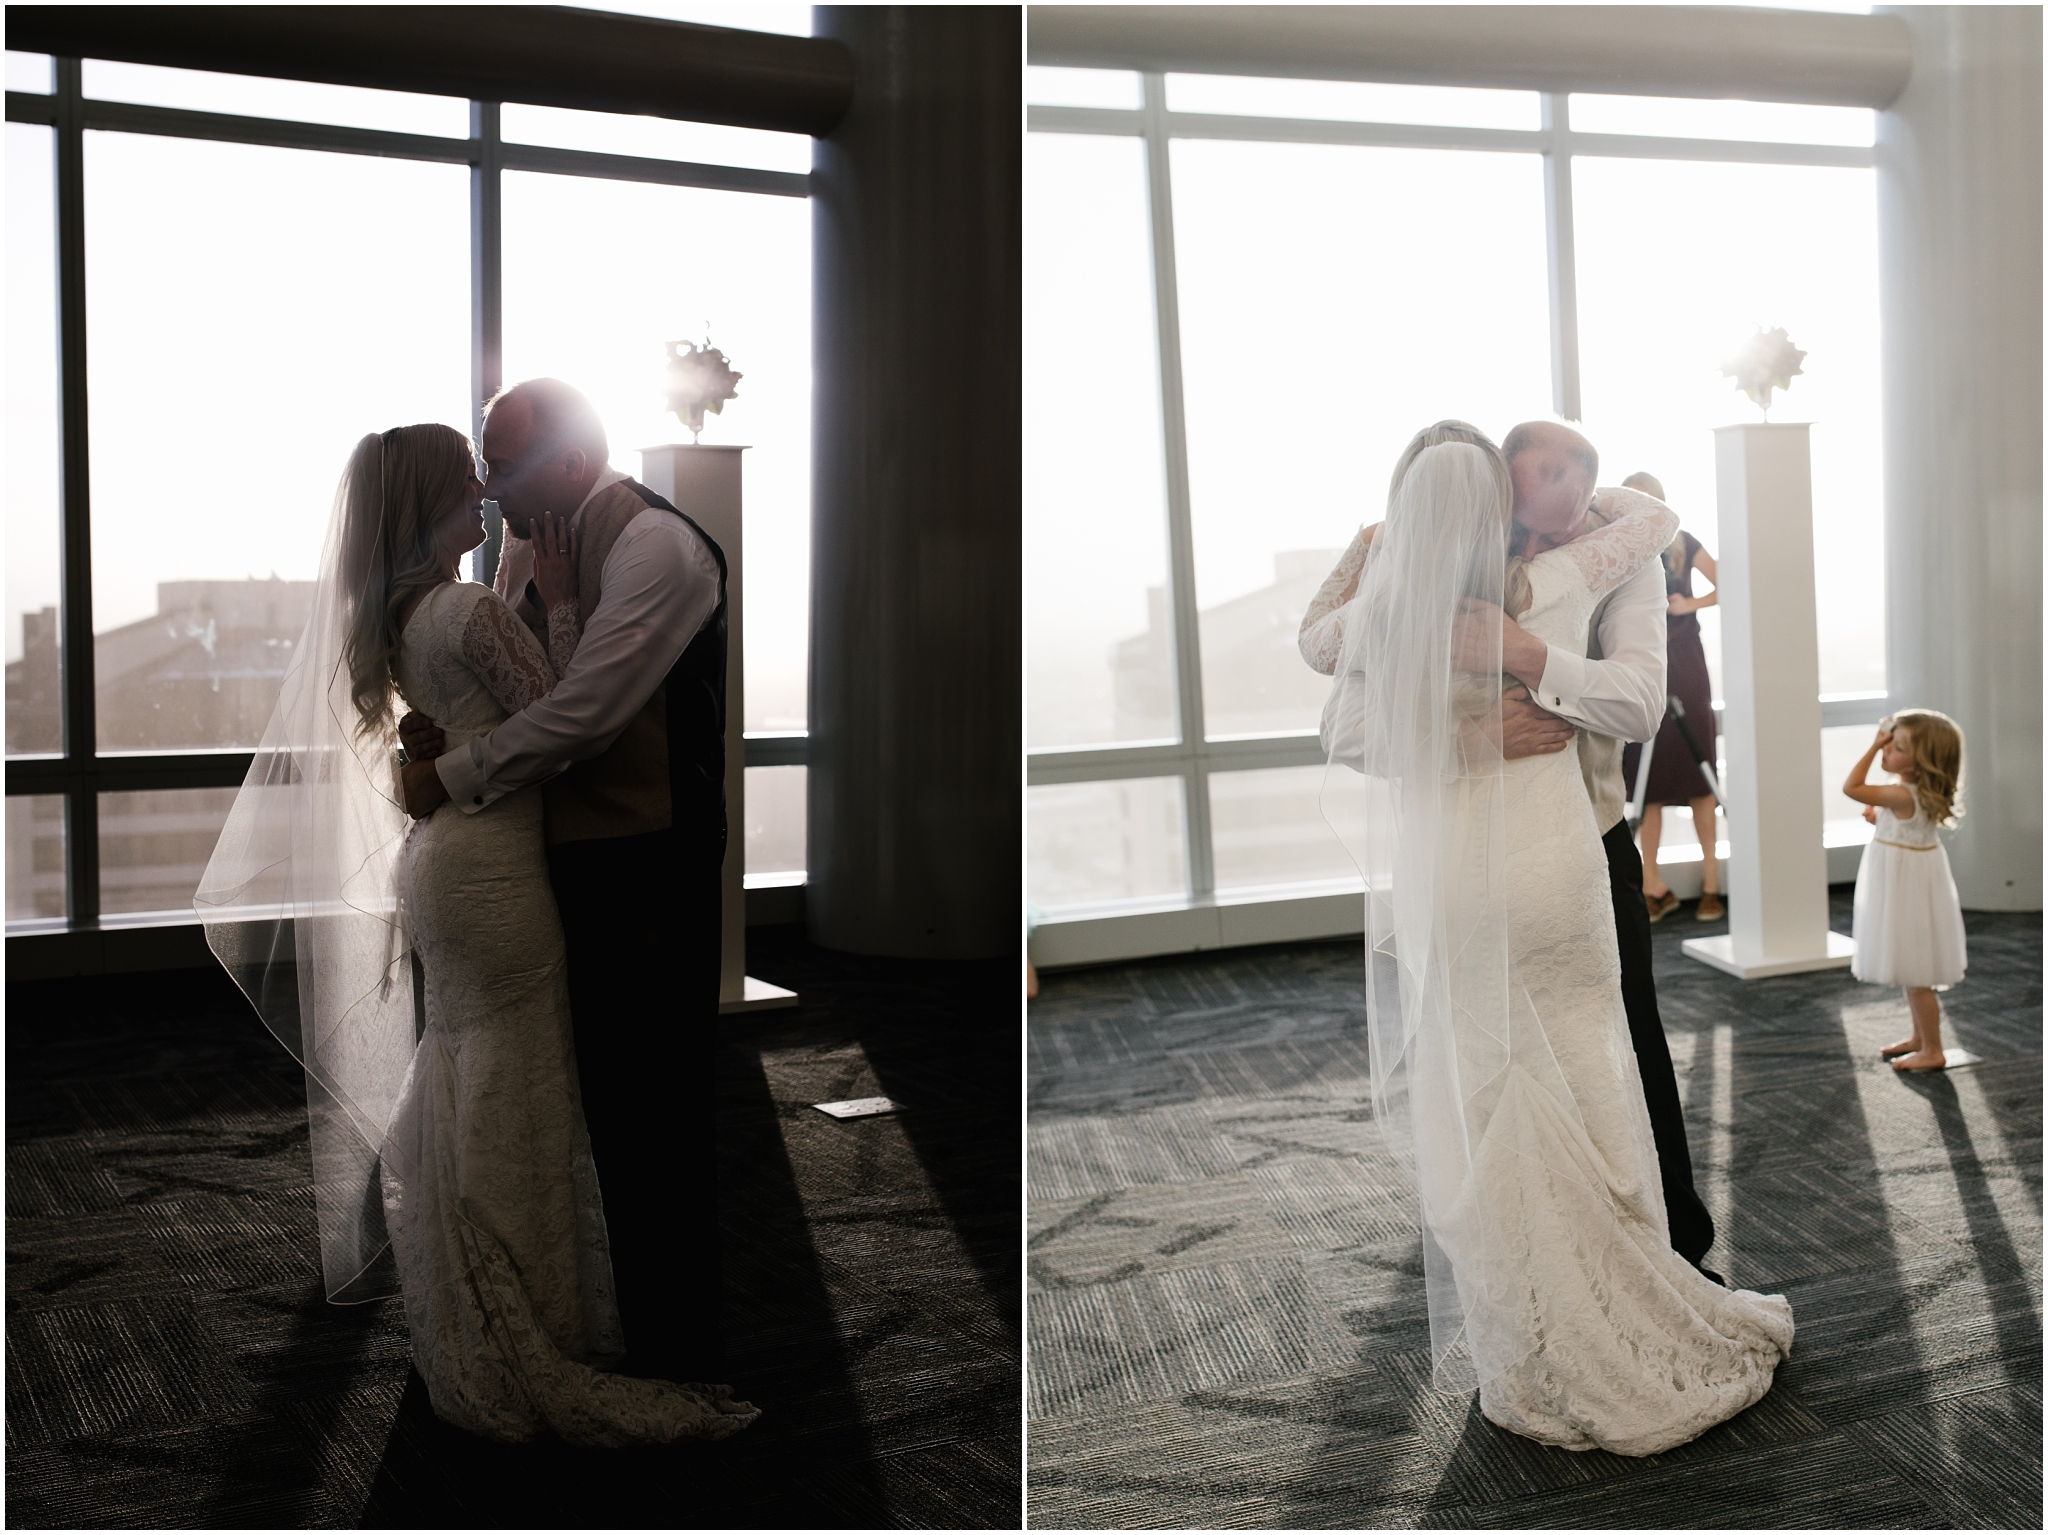 CherylandTyler-563_Lizzie-B-Imagery-Utah-Wedding-Photographer-Salt-Lake-City-Temple-Wells-Fargo-Building-Reception.jpg